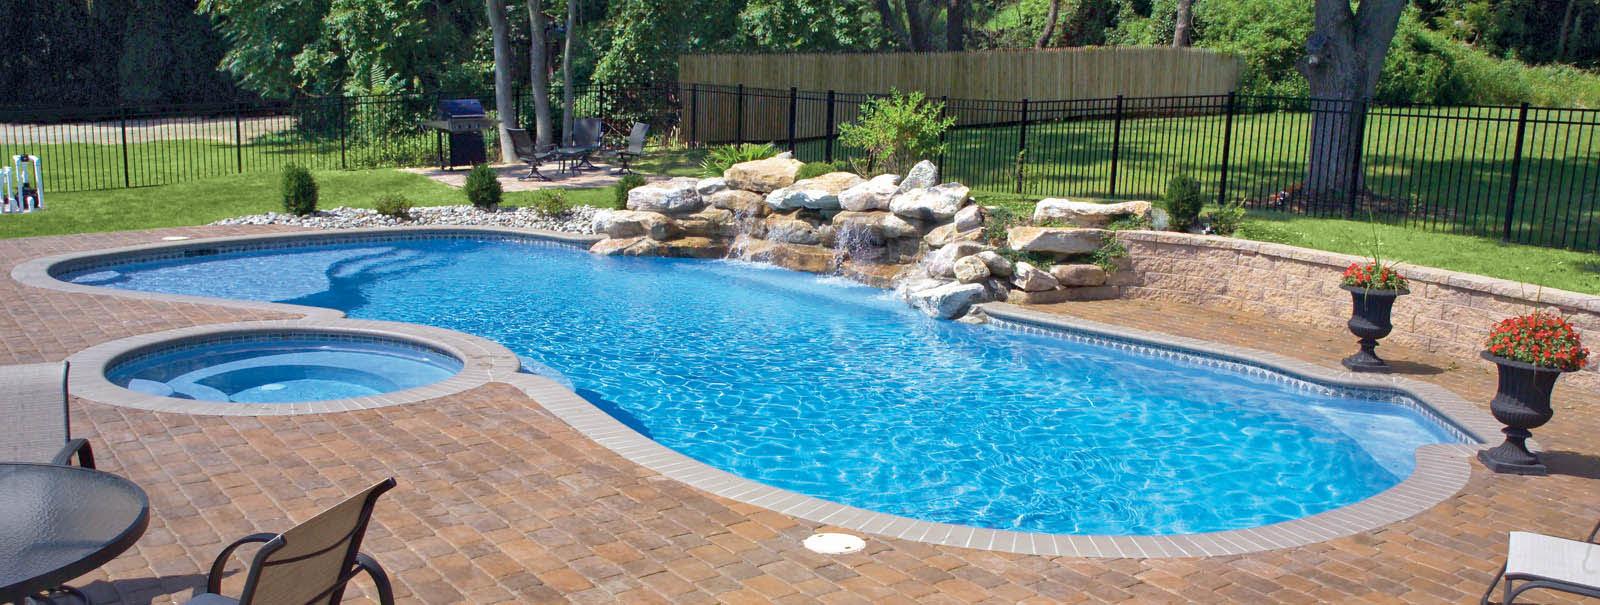 hershey-pool-photos